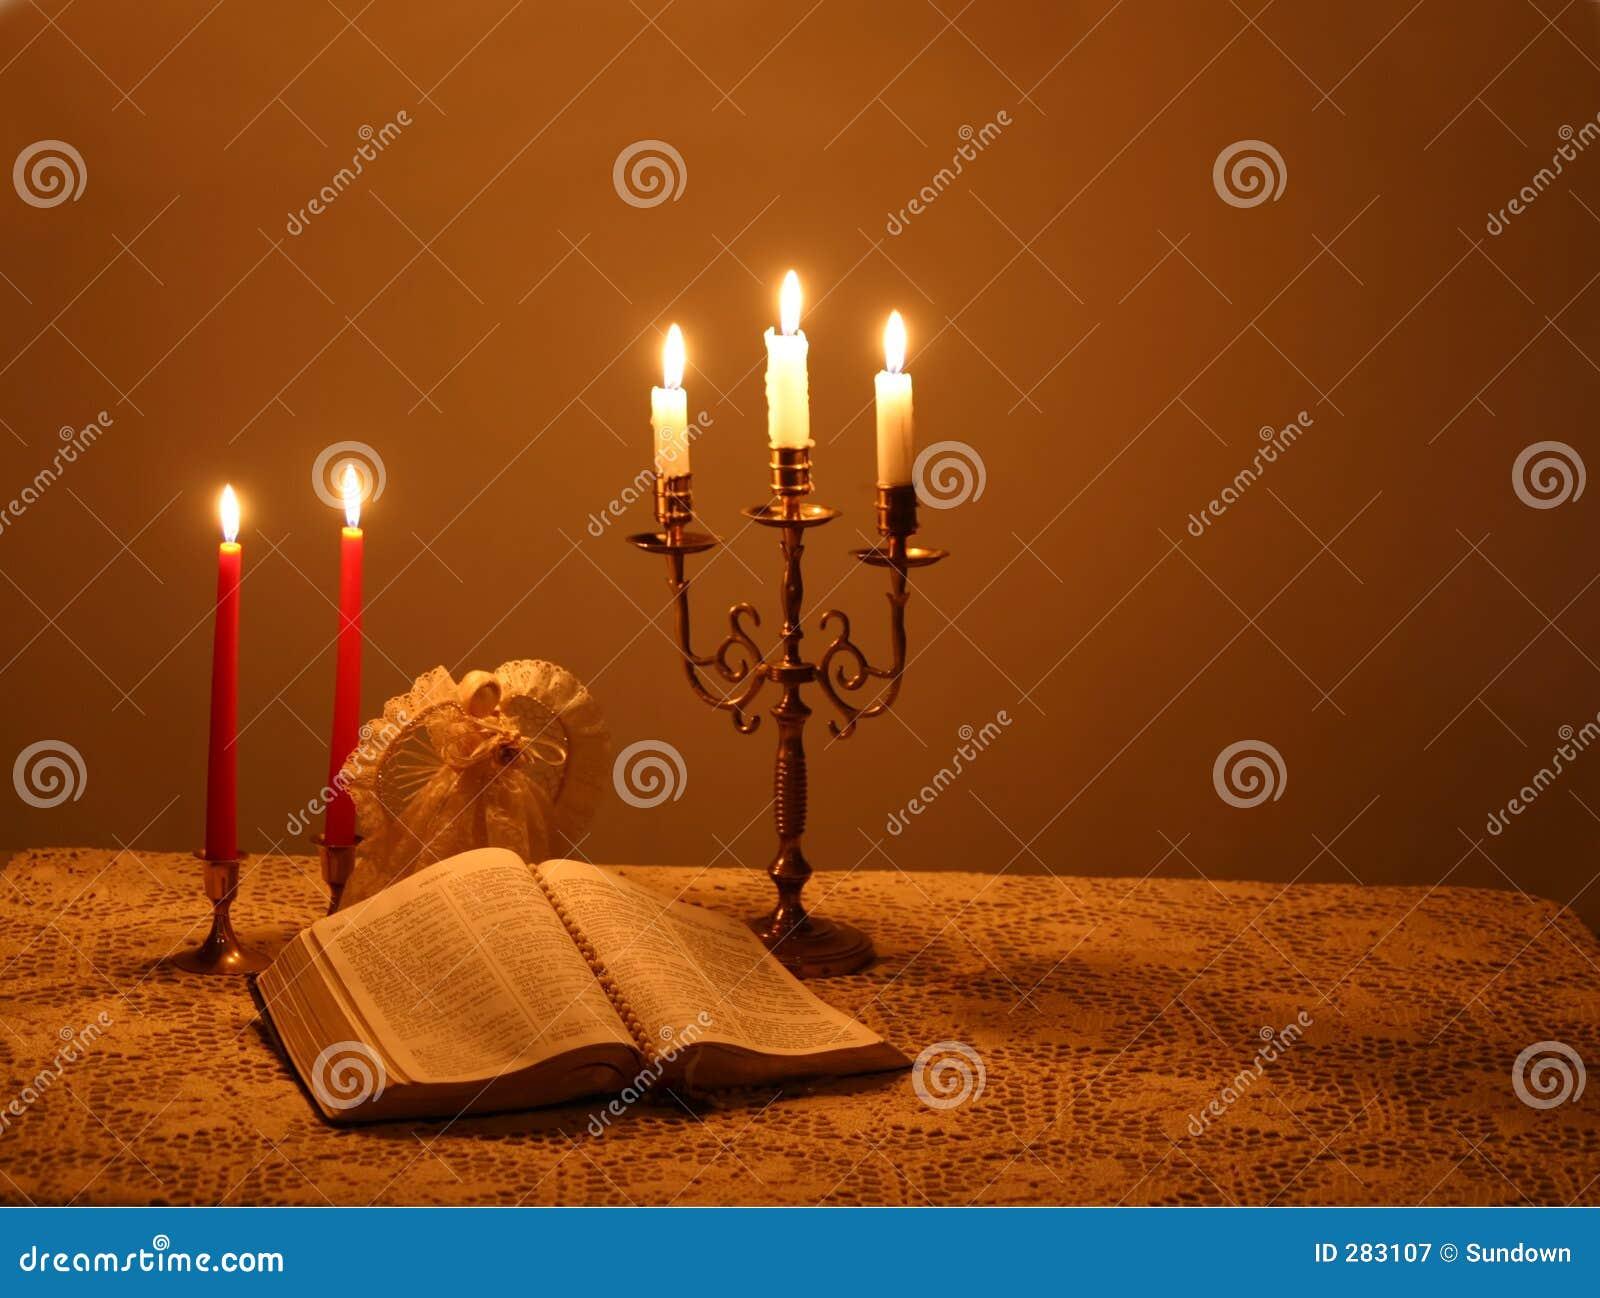 4 candlelightjul